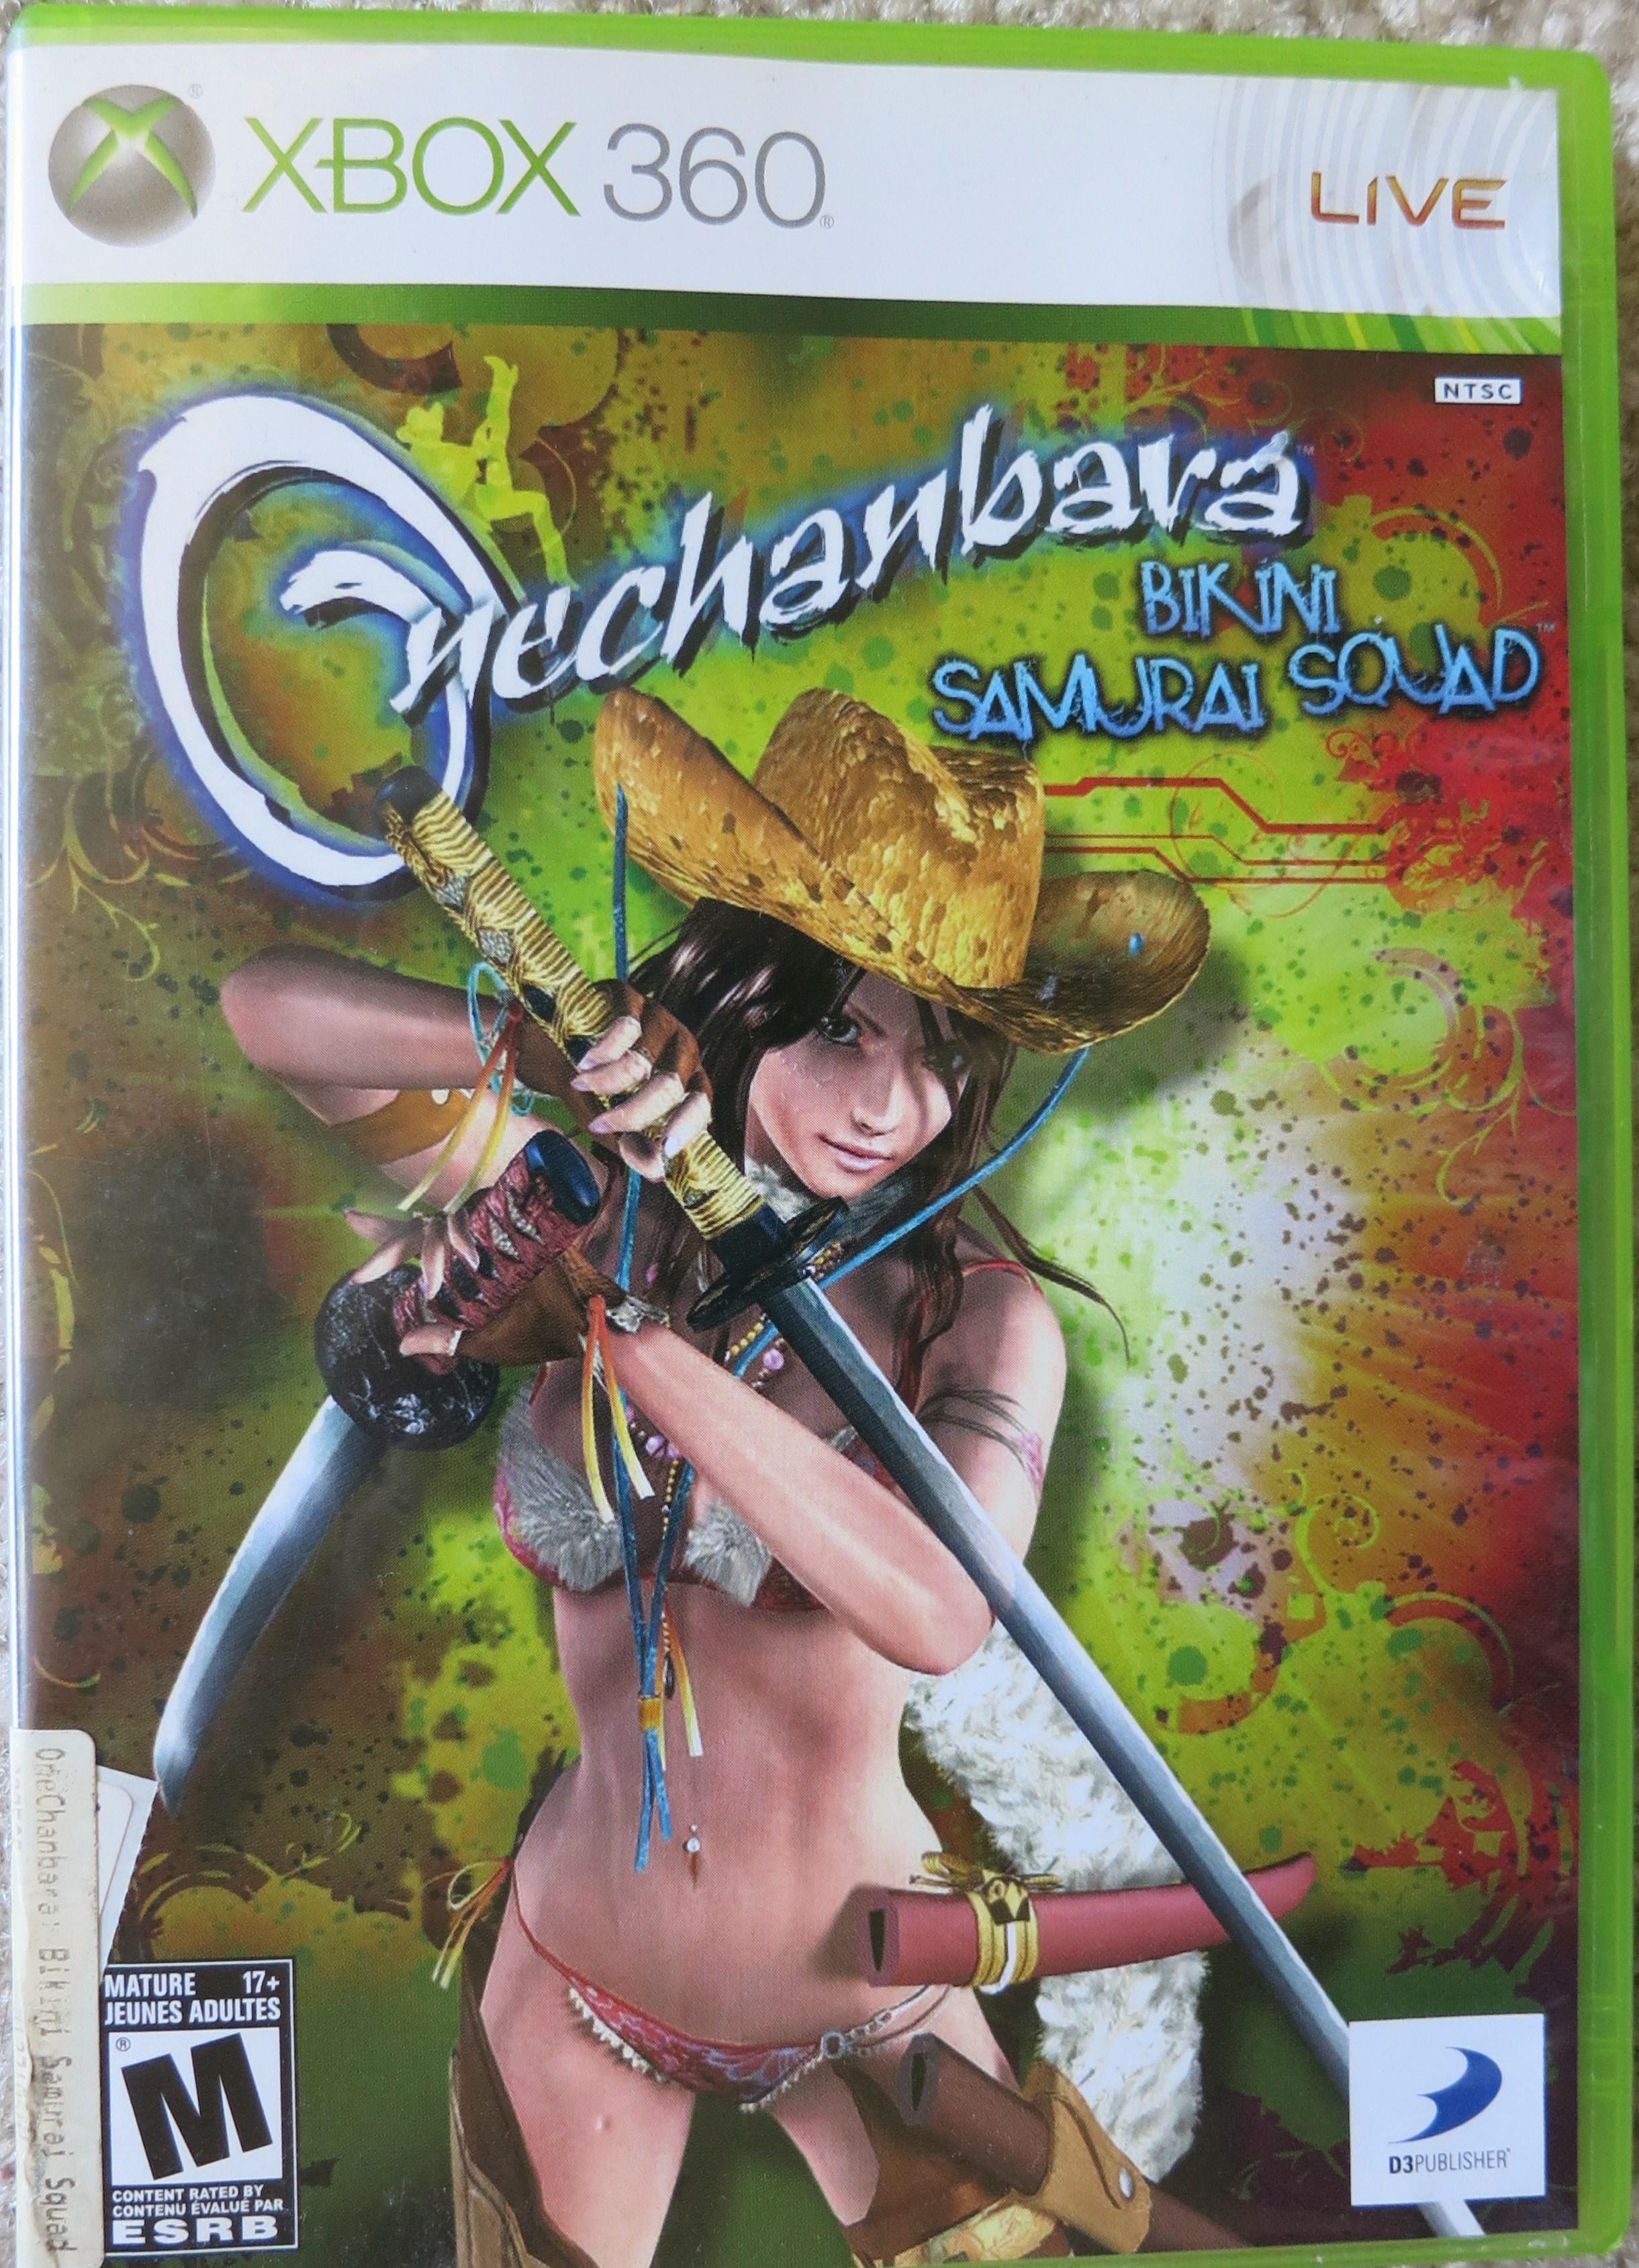 Boobs, Bikinis et Zombies sur PS4 ! Onechanbara Z2